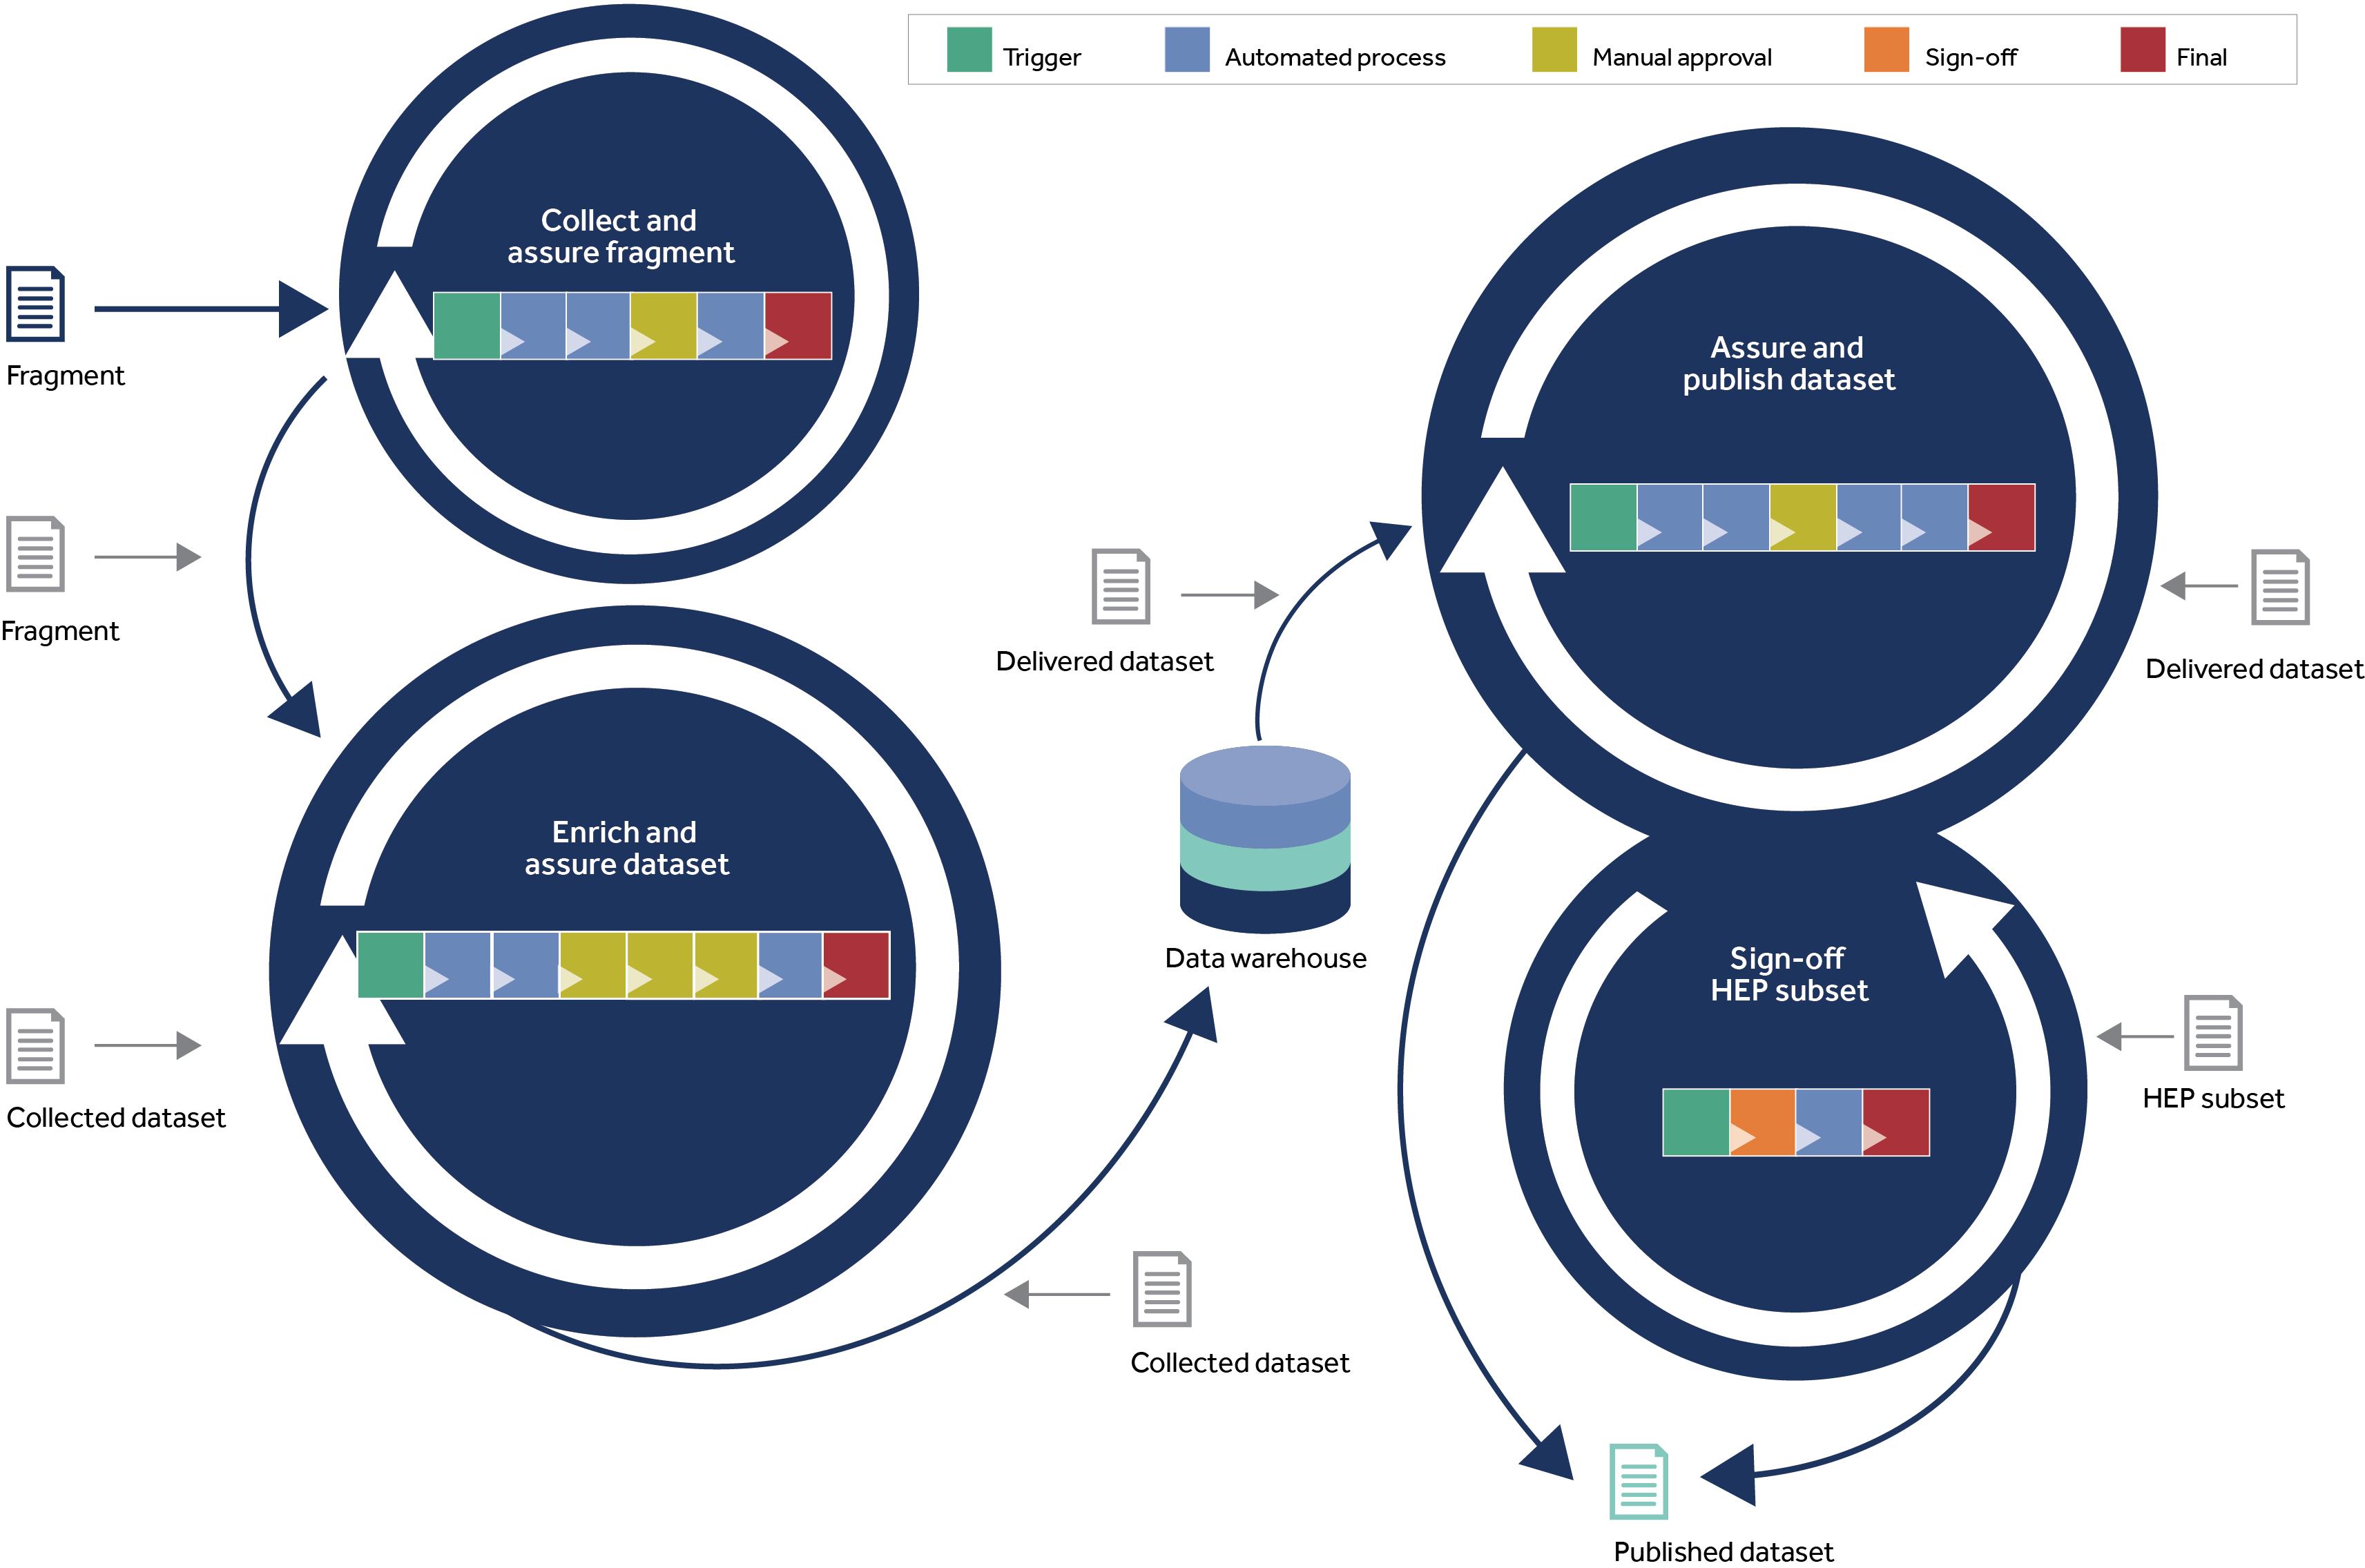 Quality assurance model (Data Futures)